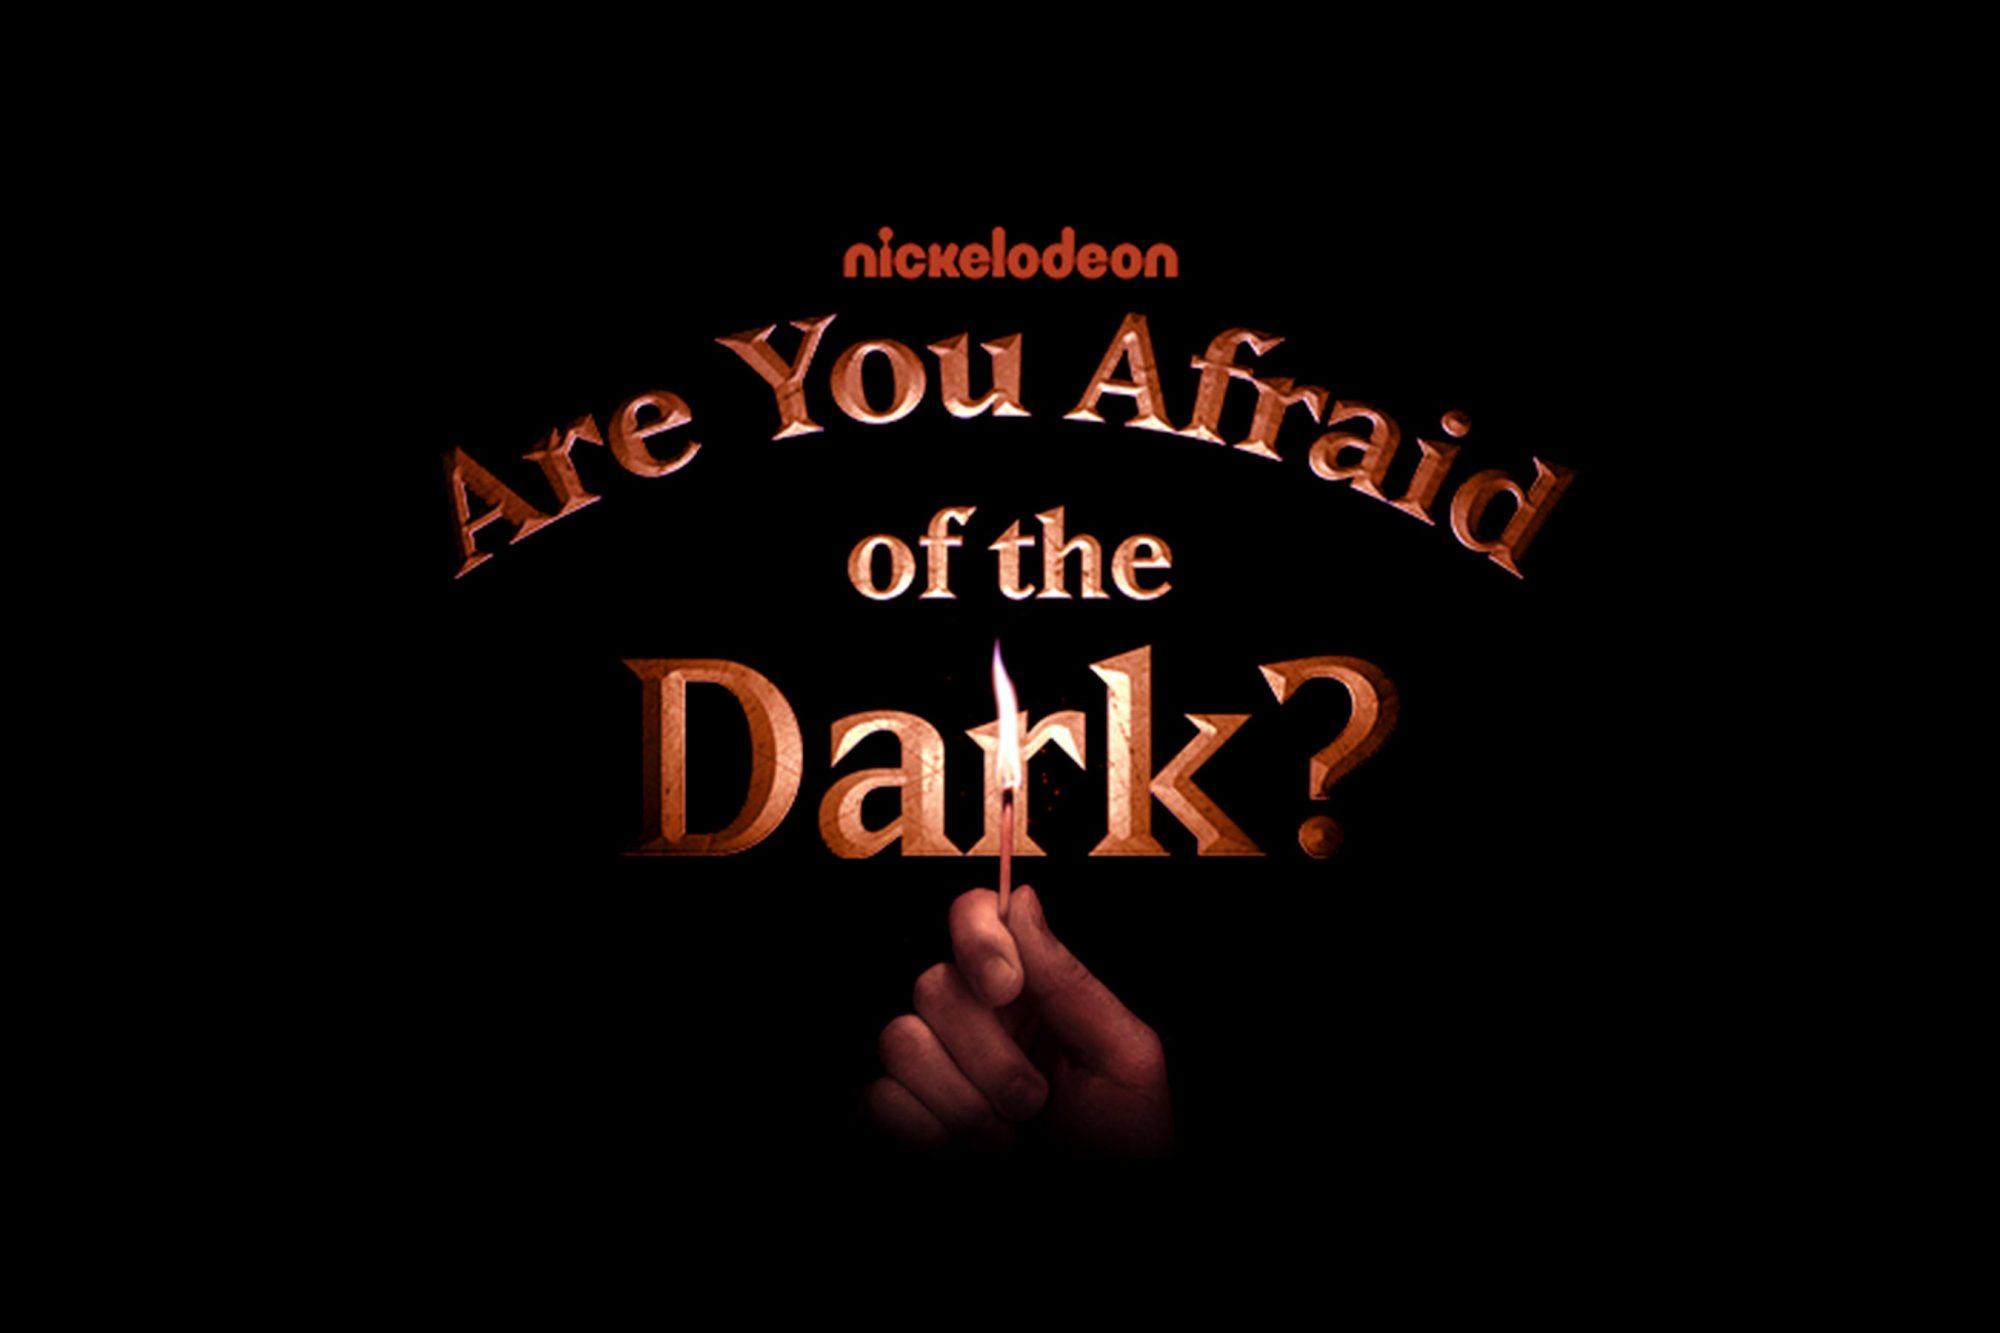 Are You Afraid of the Dark? key art CR: Nickelodeon